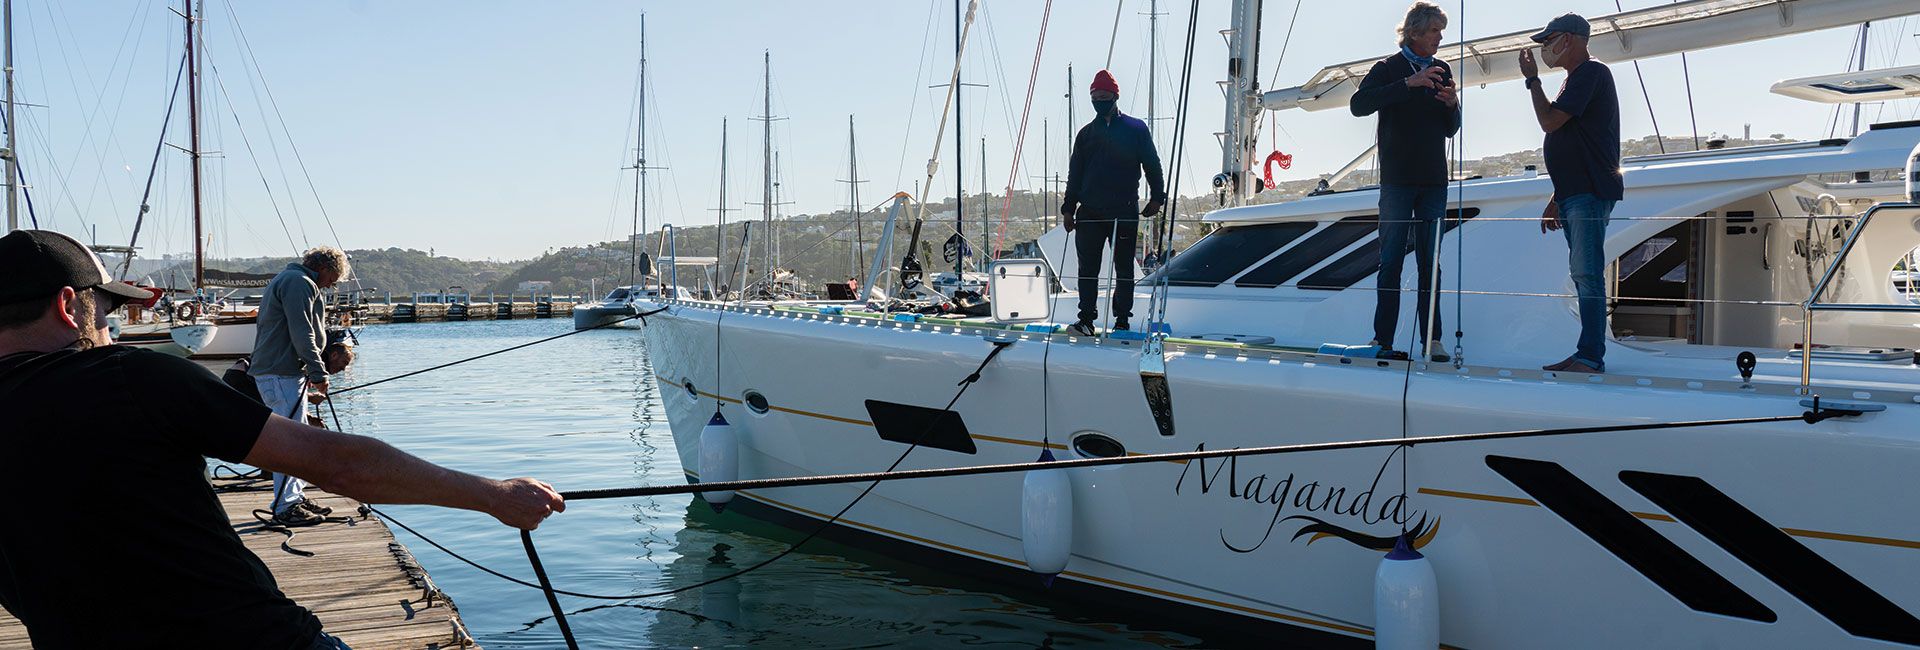 Docking a yacht